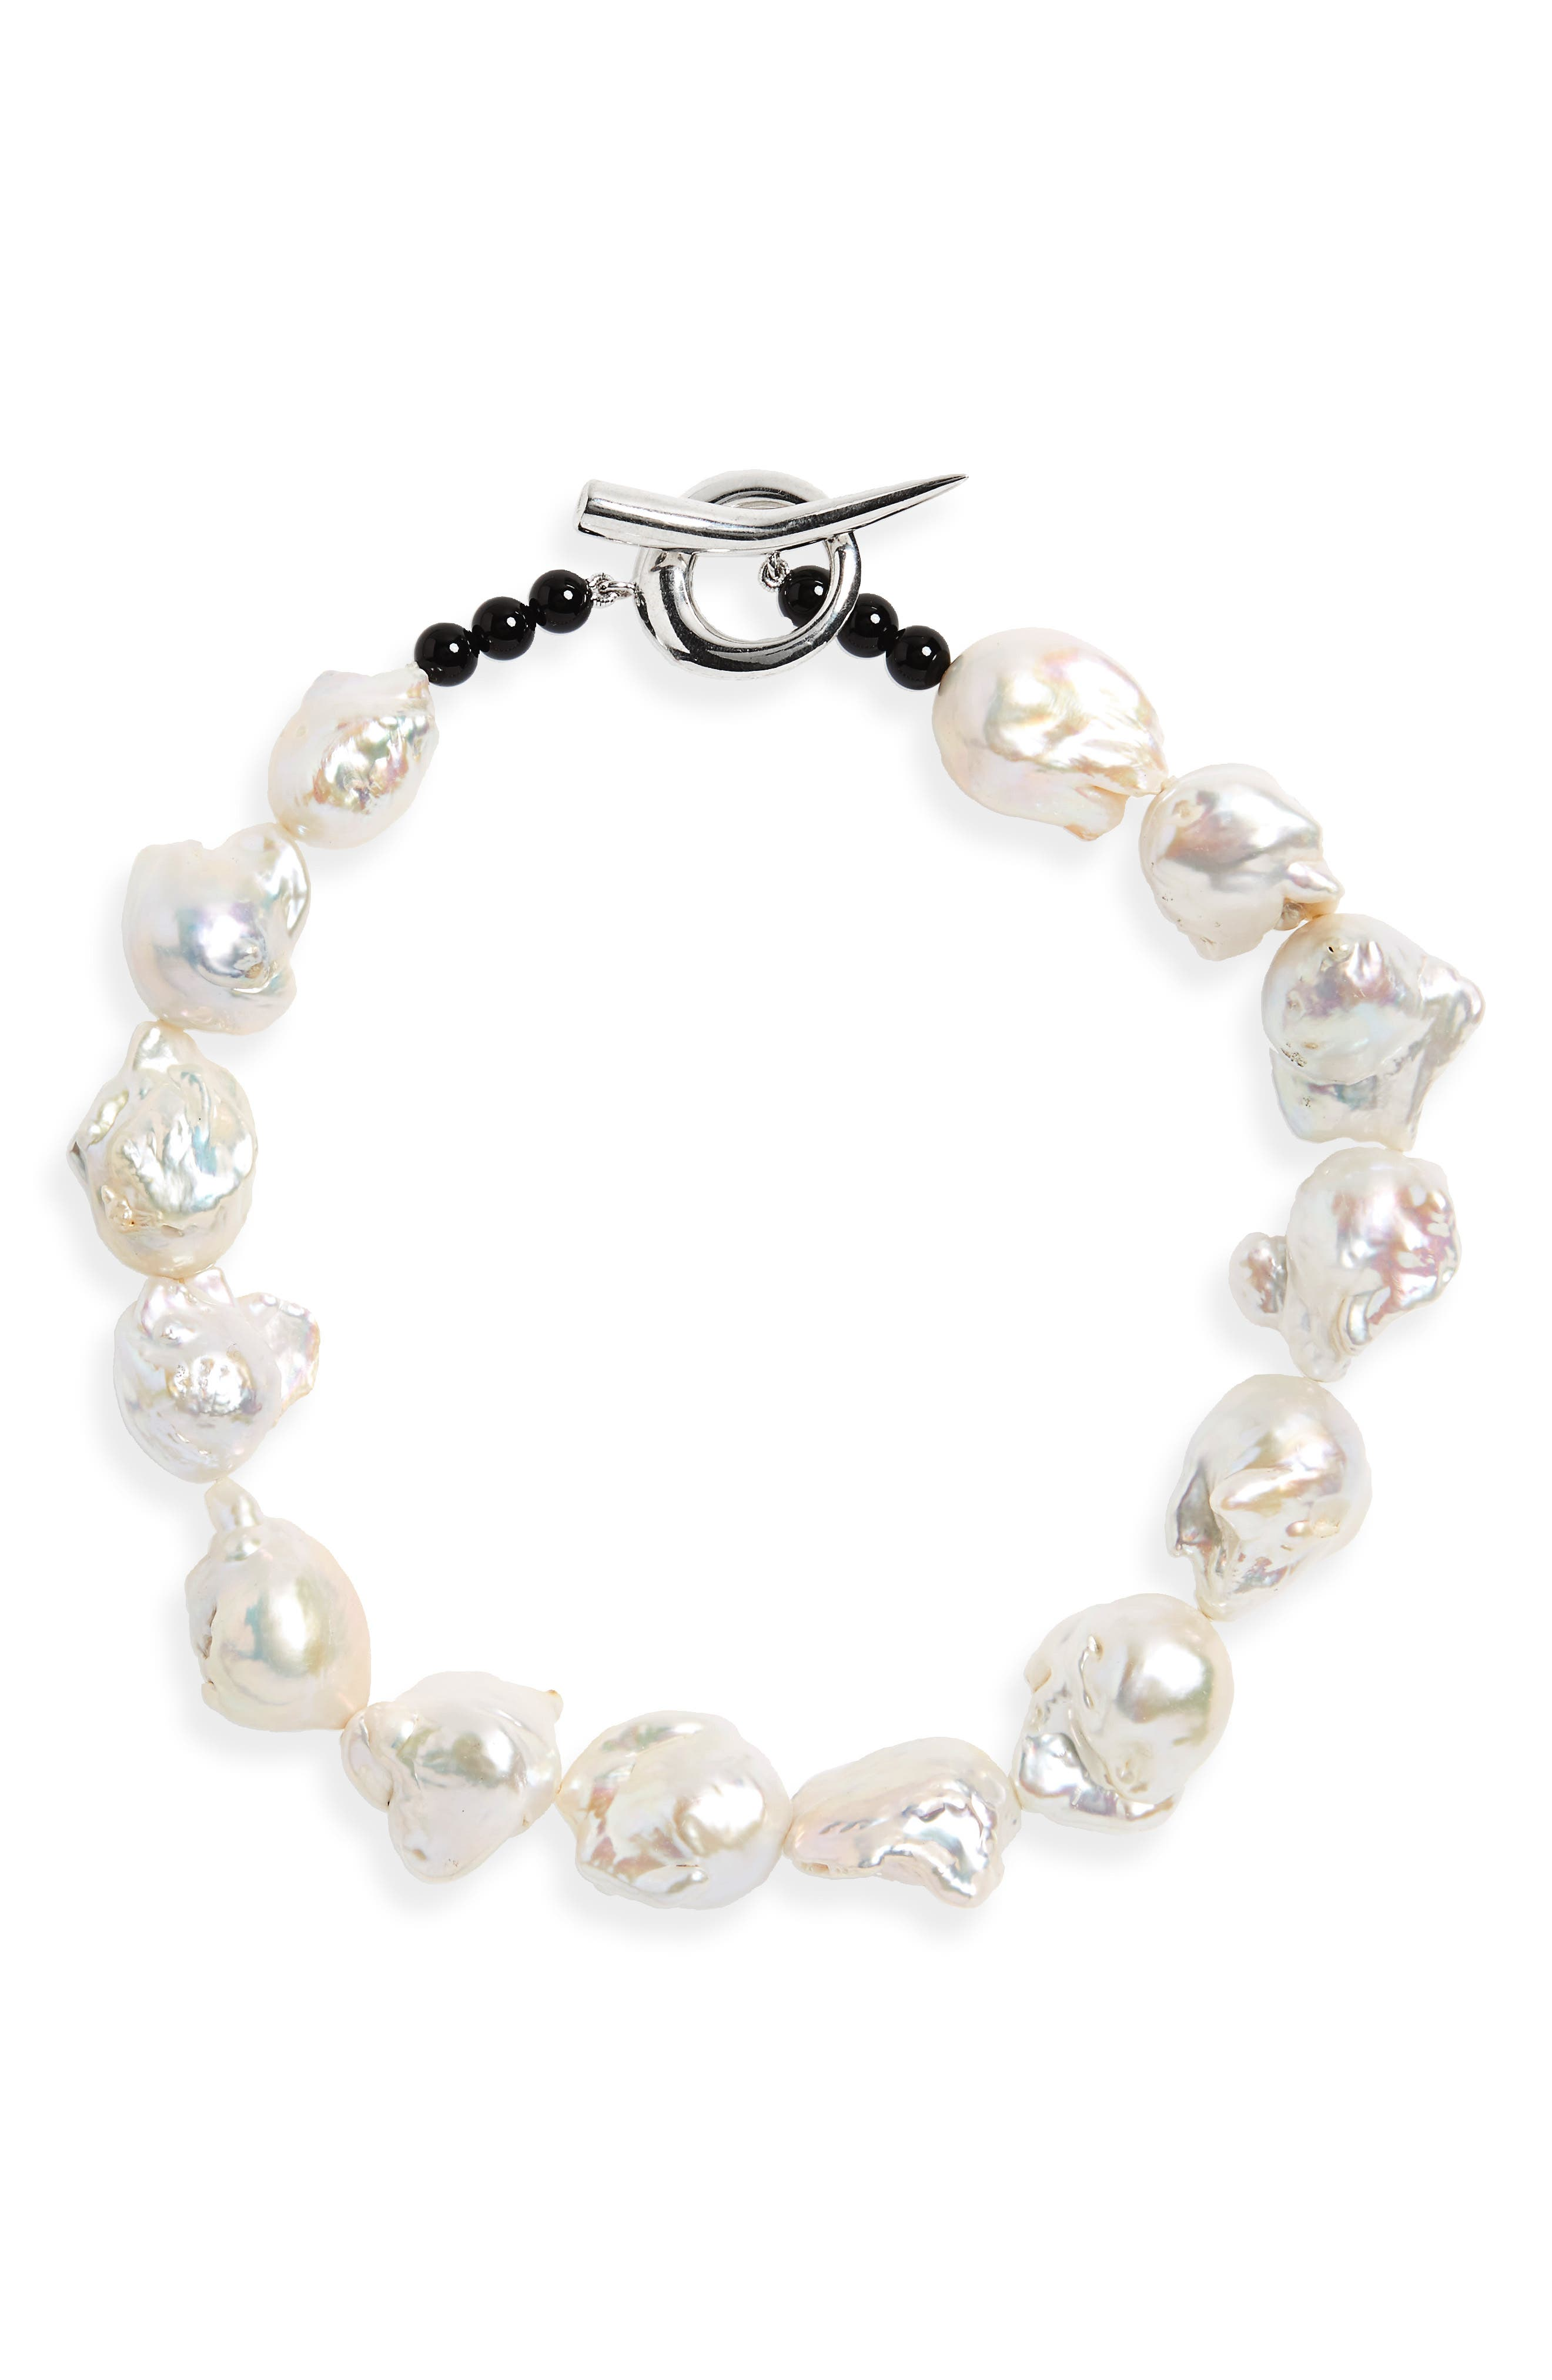 Baroque Pearl Collar Necklace,                             Main thumbnail 1, color,                             040